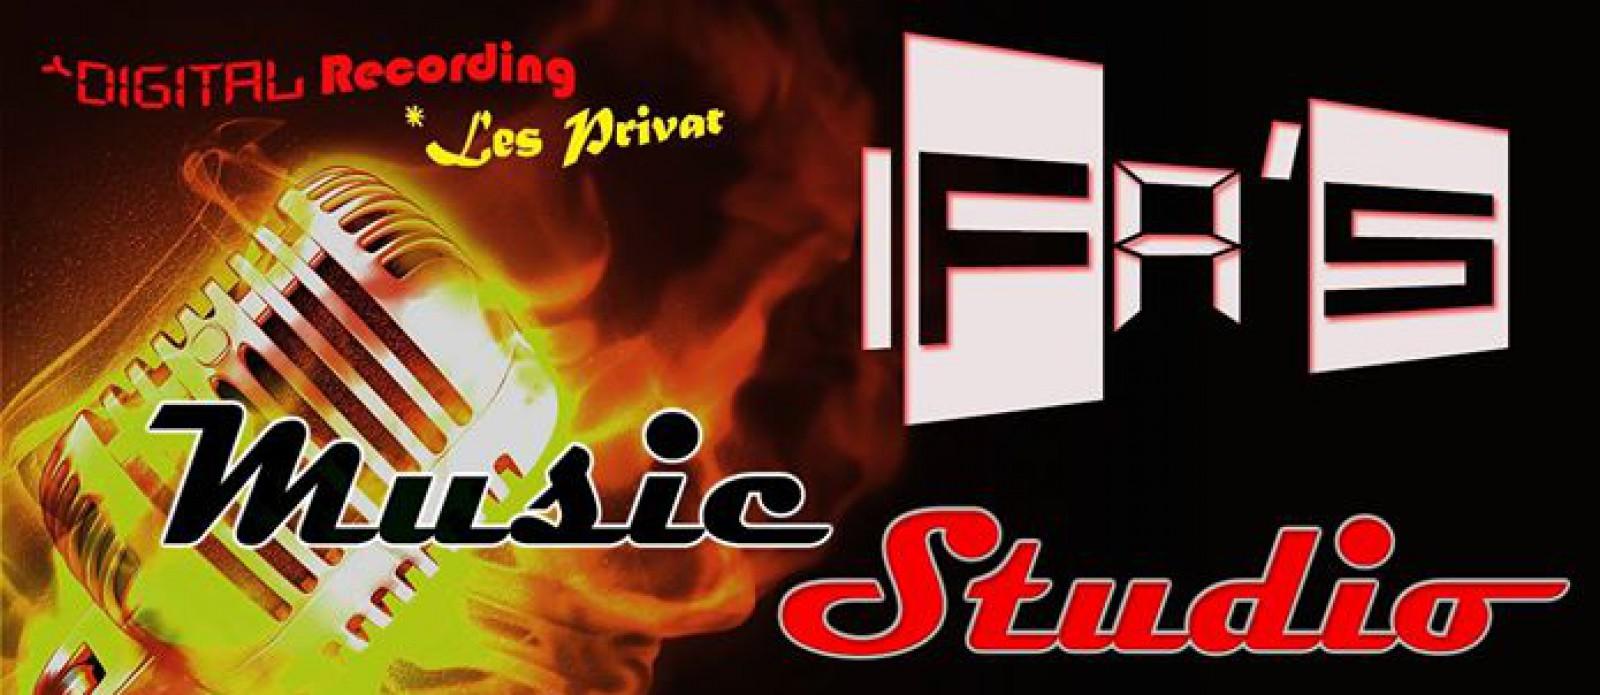 IFA's MUSIK STUDIO